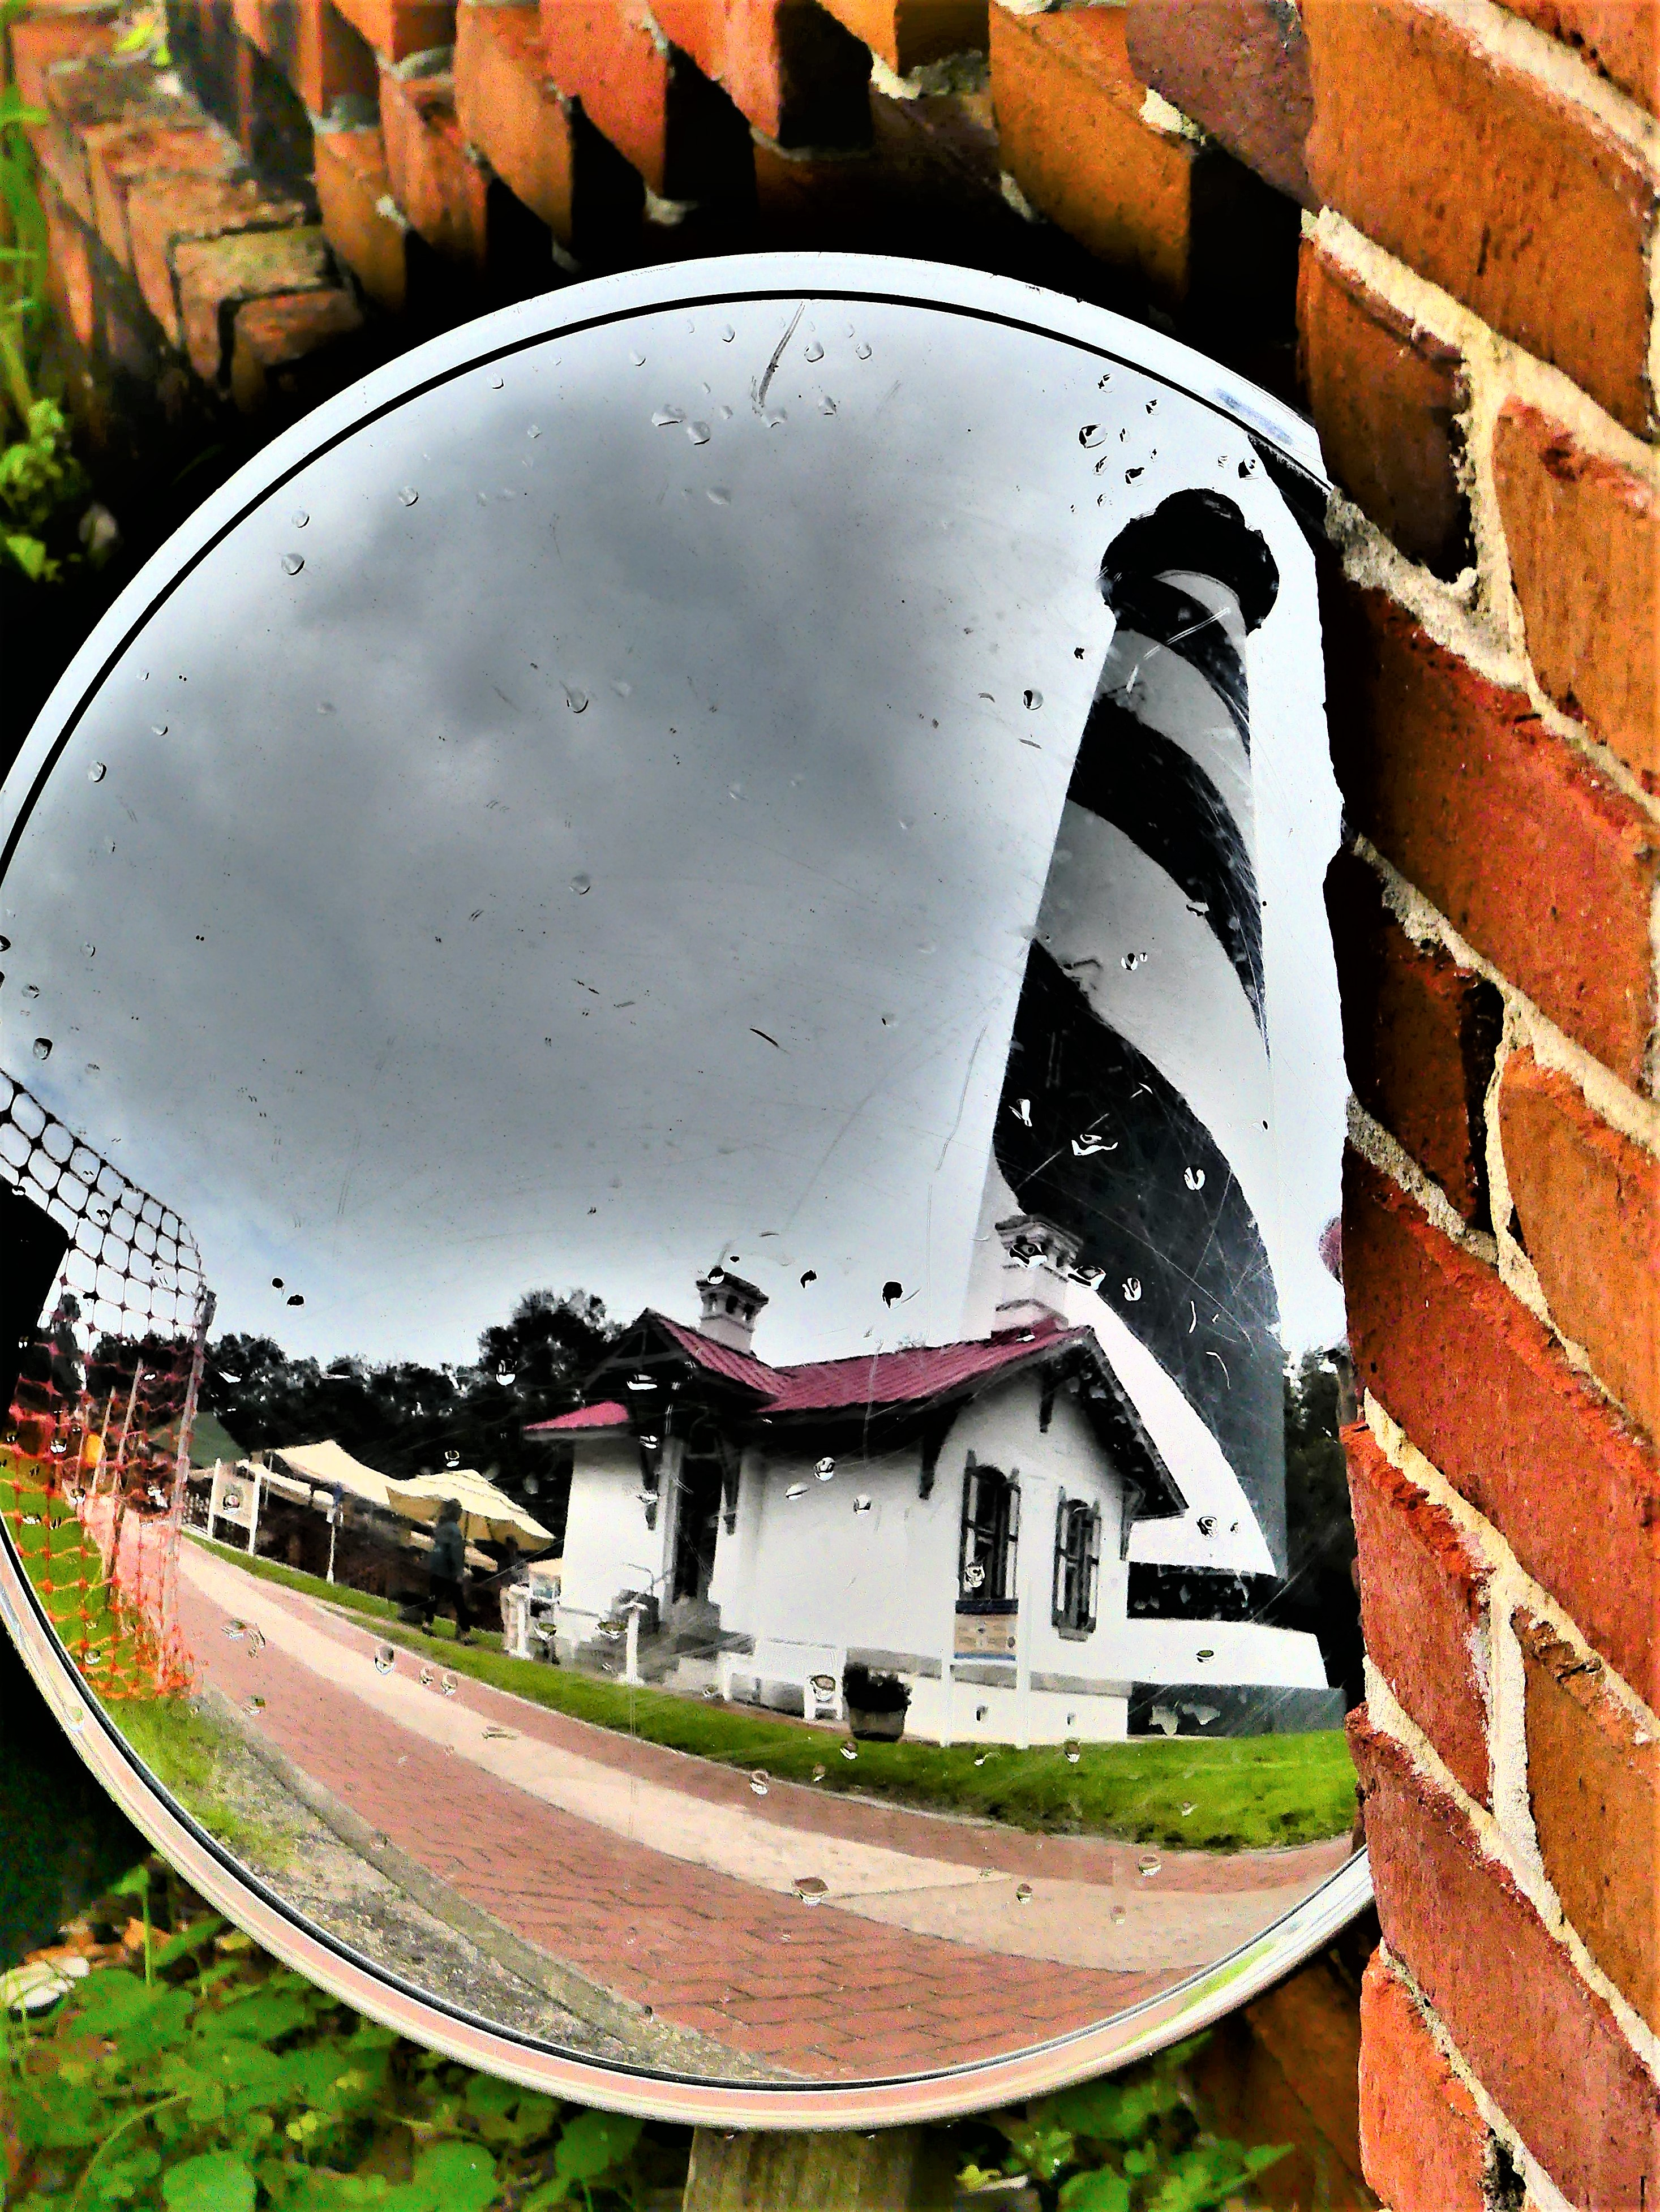 Parabolic view